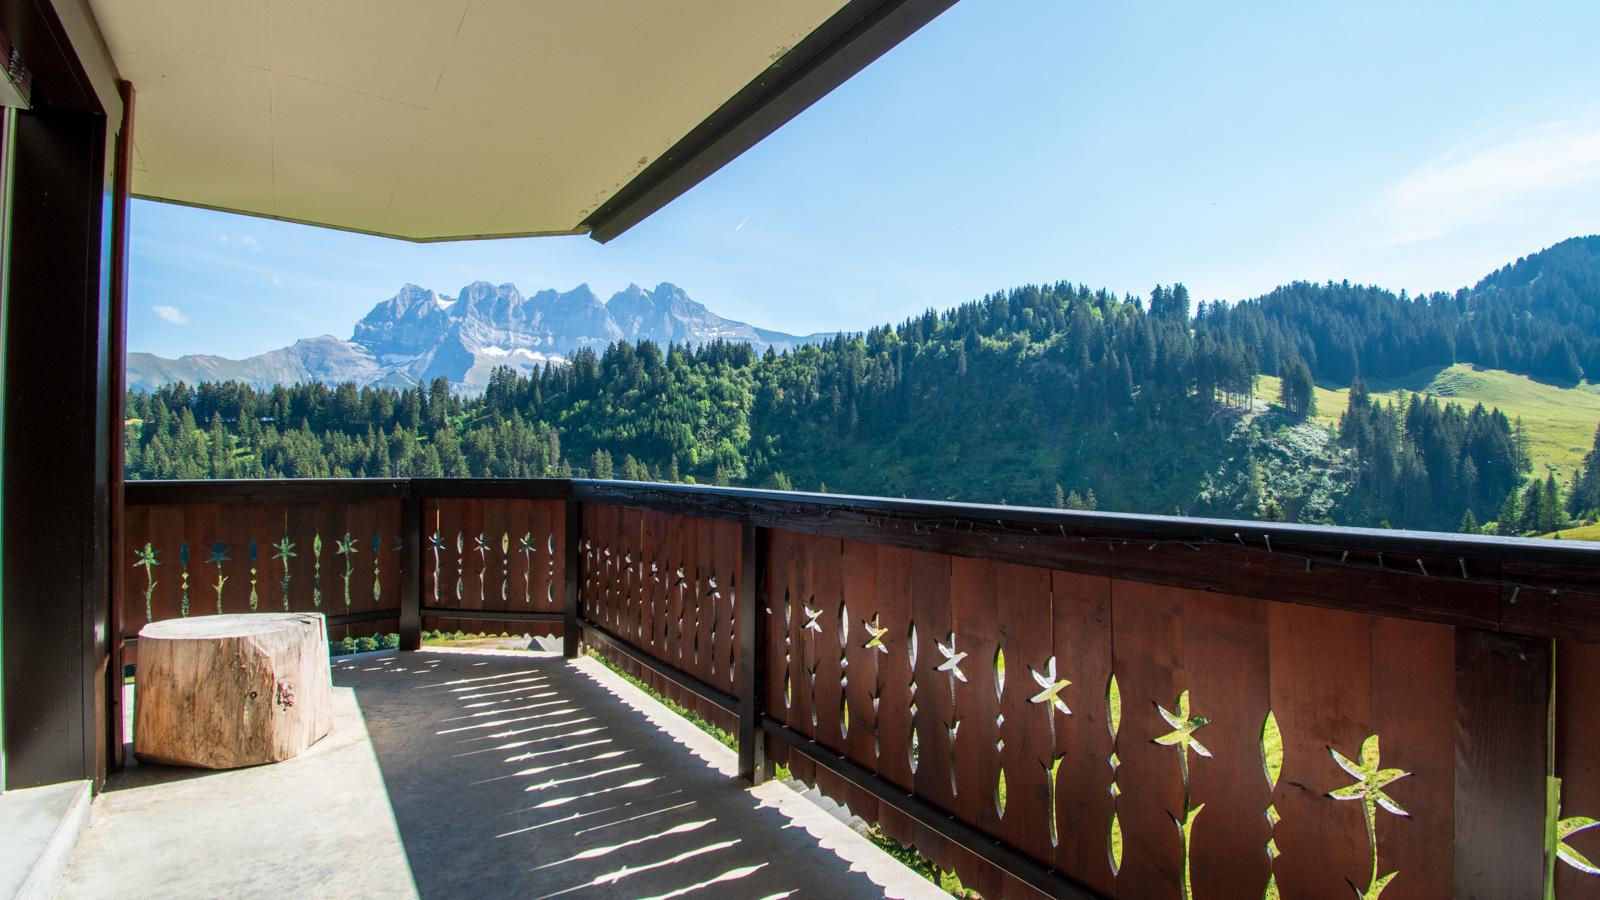 Les Mayots Apartments, Switzerland